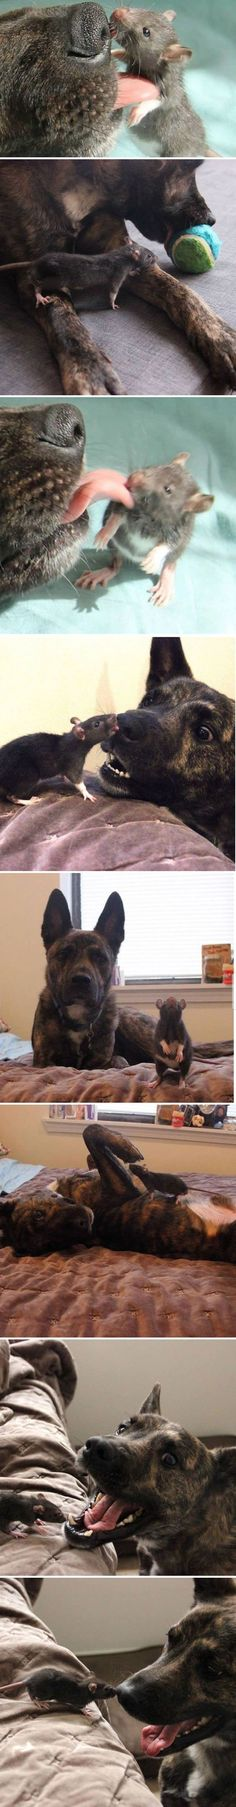 rat and dog are BEST FRIENDS #echtlustig.com